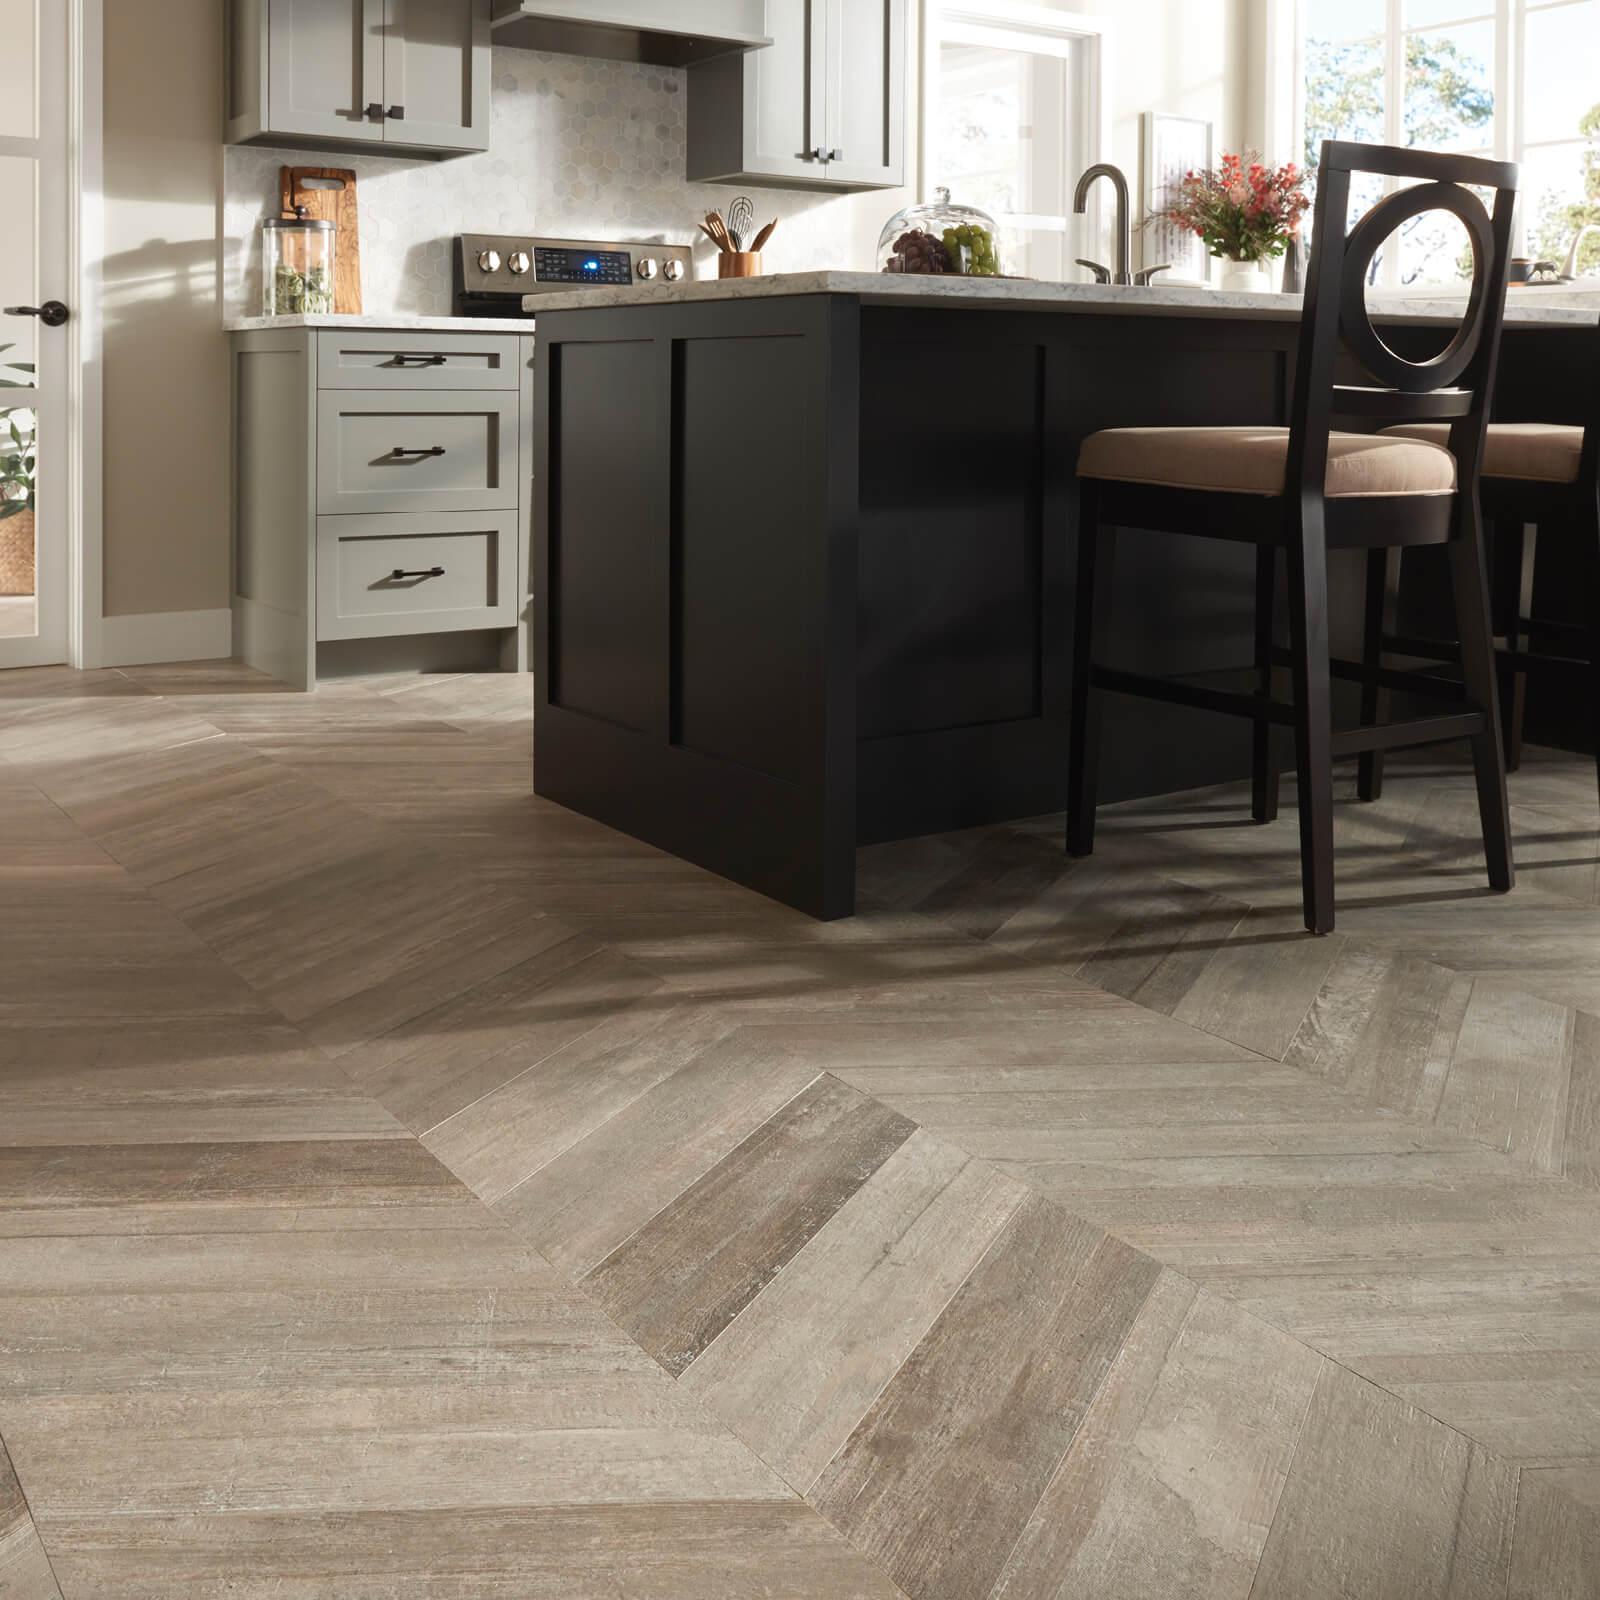 Glee chevron tile flooring | PDJ Flooring